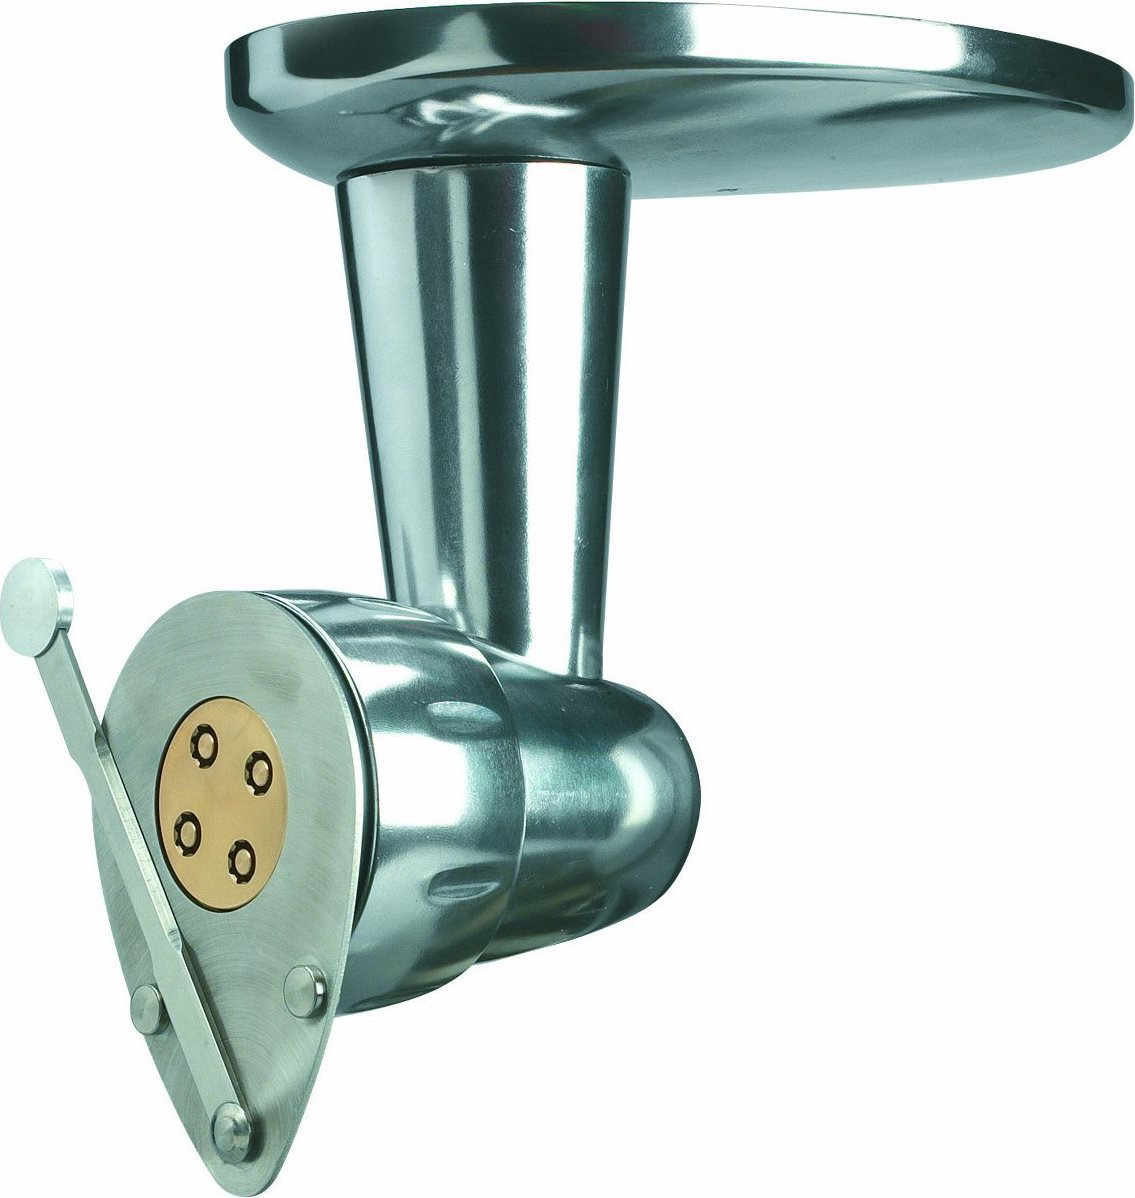 Kenwood Torchio per pasta Accessorio per robot da cucina AT910